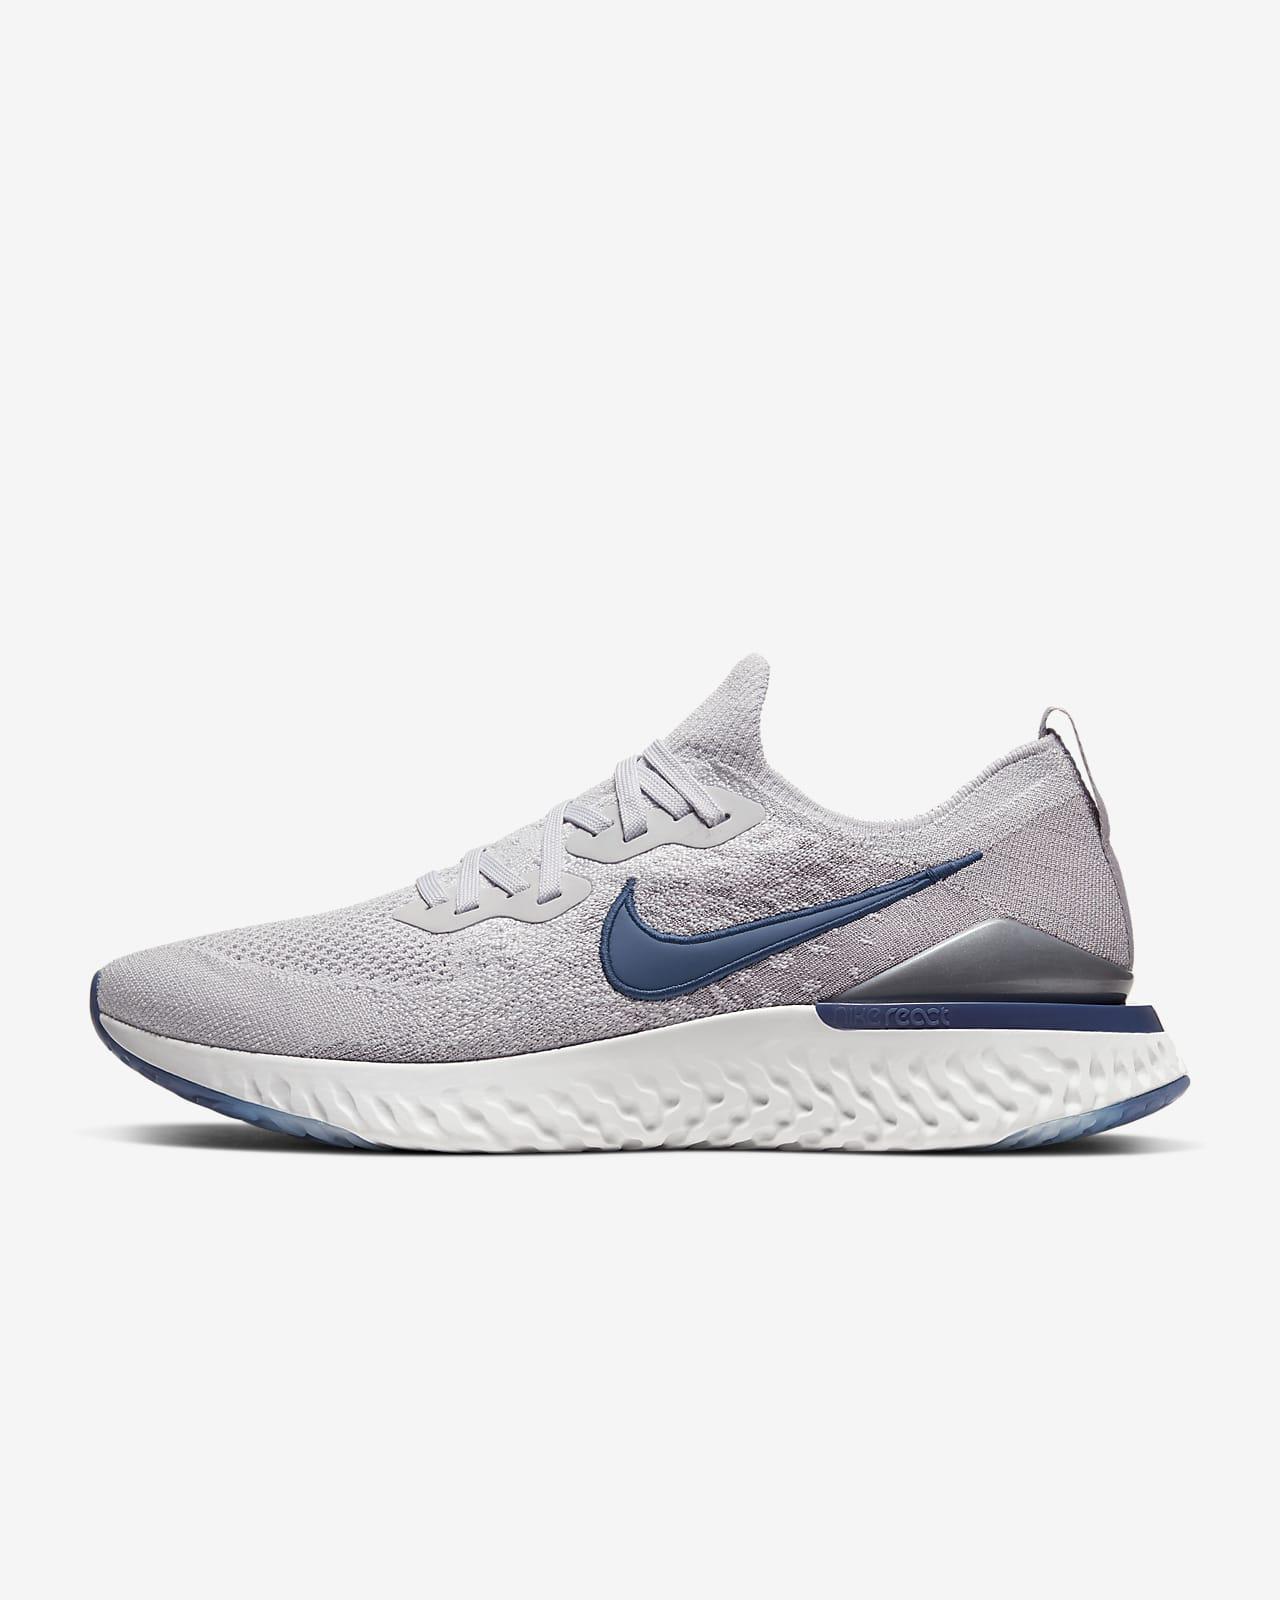 Nike Epic React Flyknit 2 Men's Running Shoes